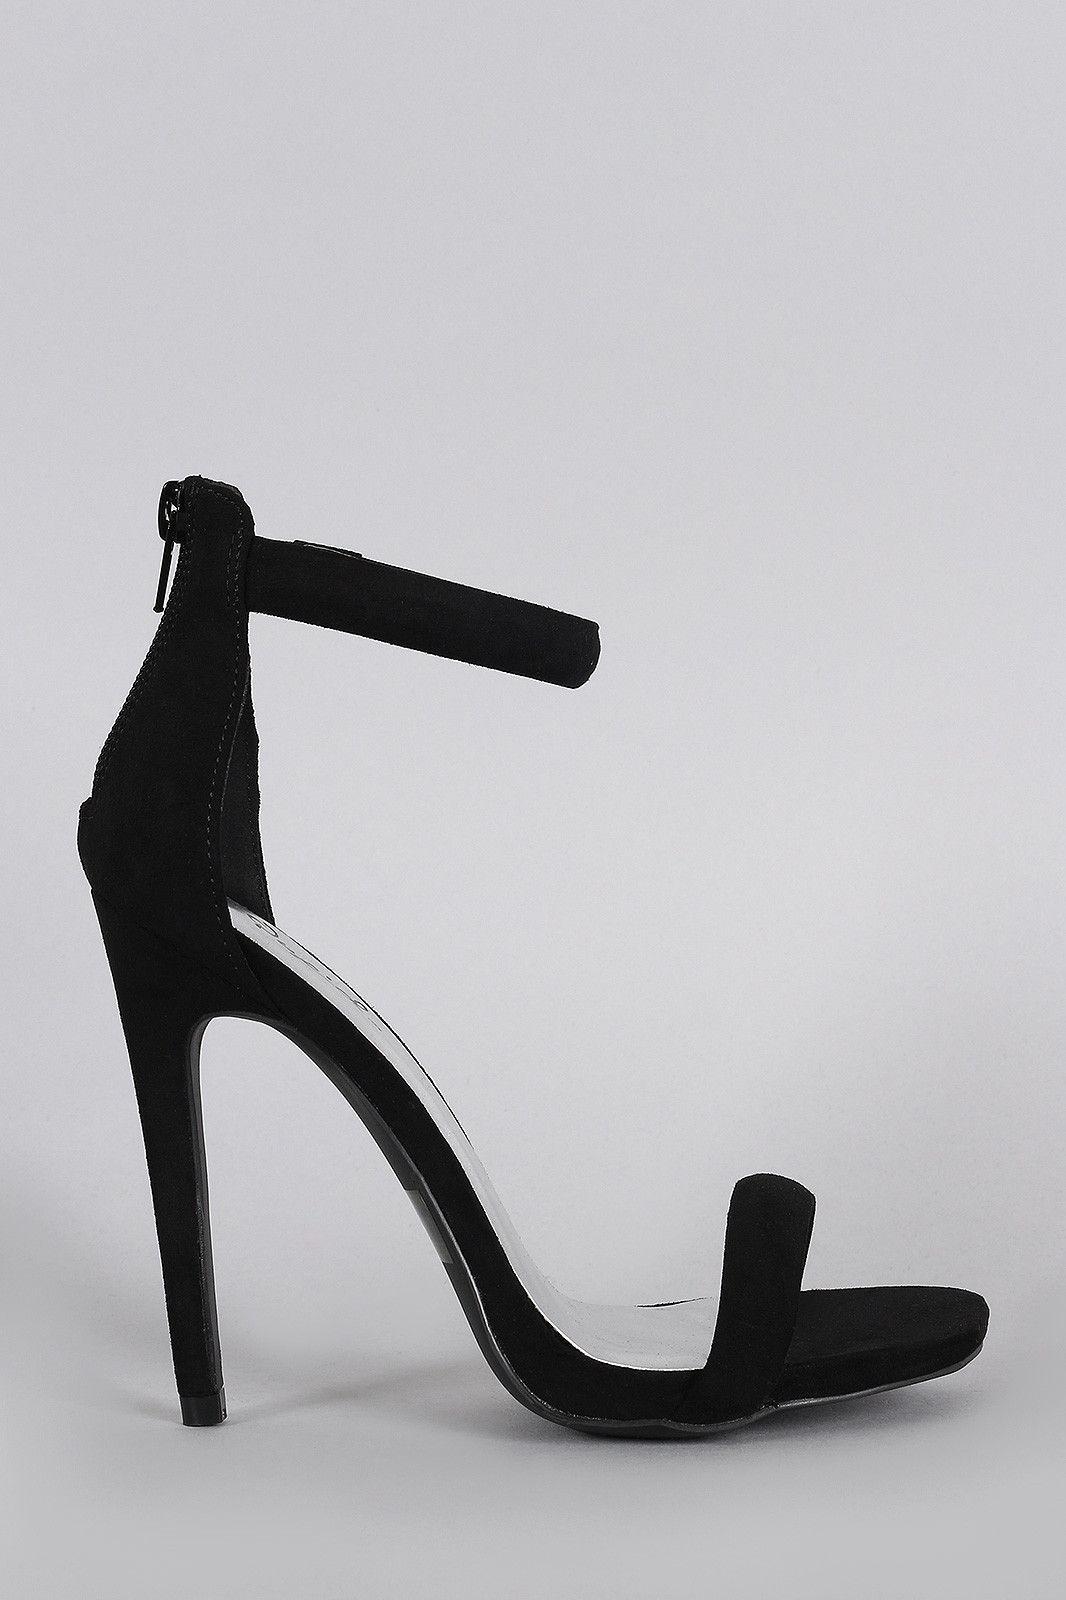 ca8c913a84ce3 Qupid Classic Ankle Strap Open Toe Heel | Shoe love is True love ...